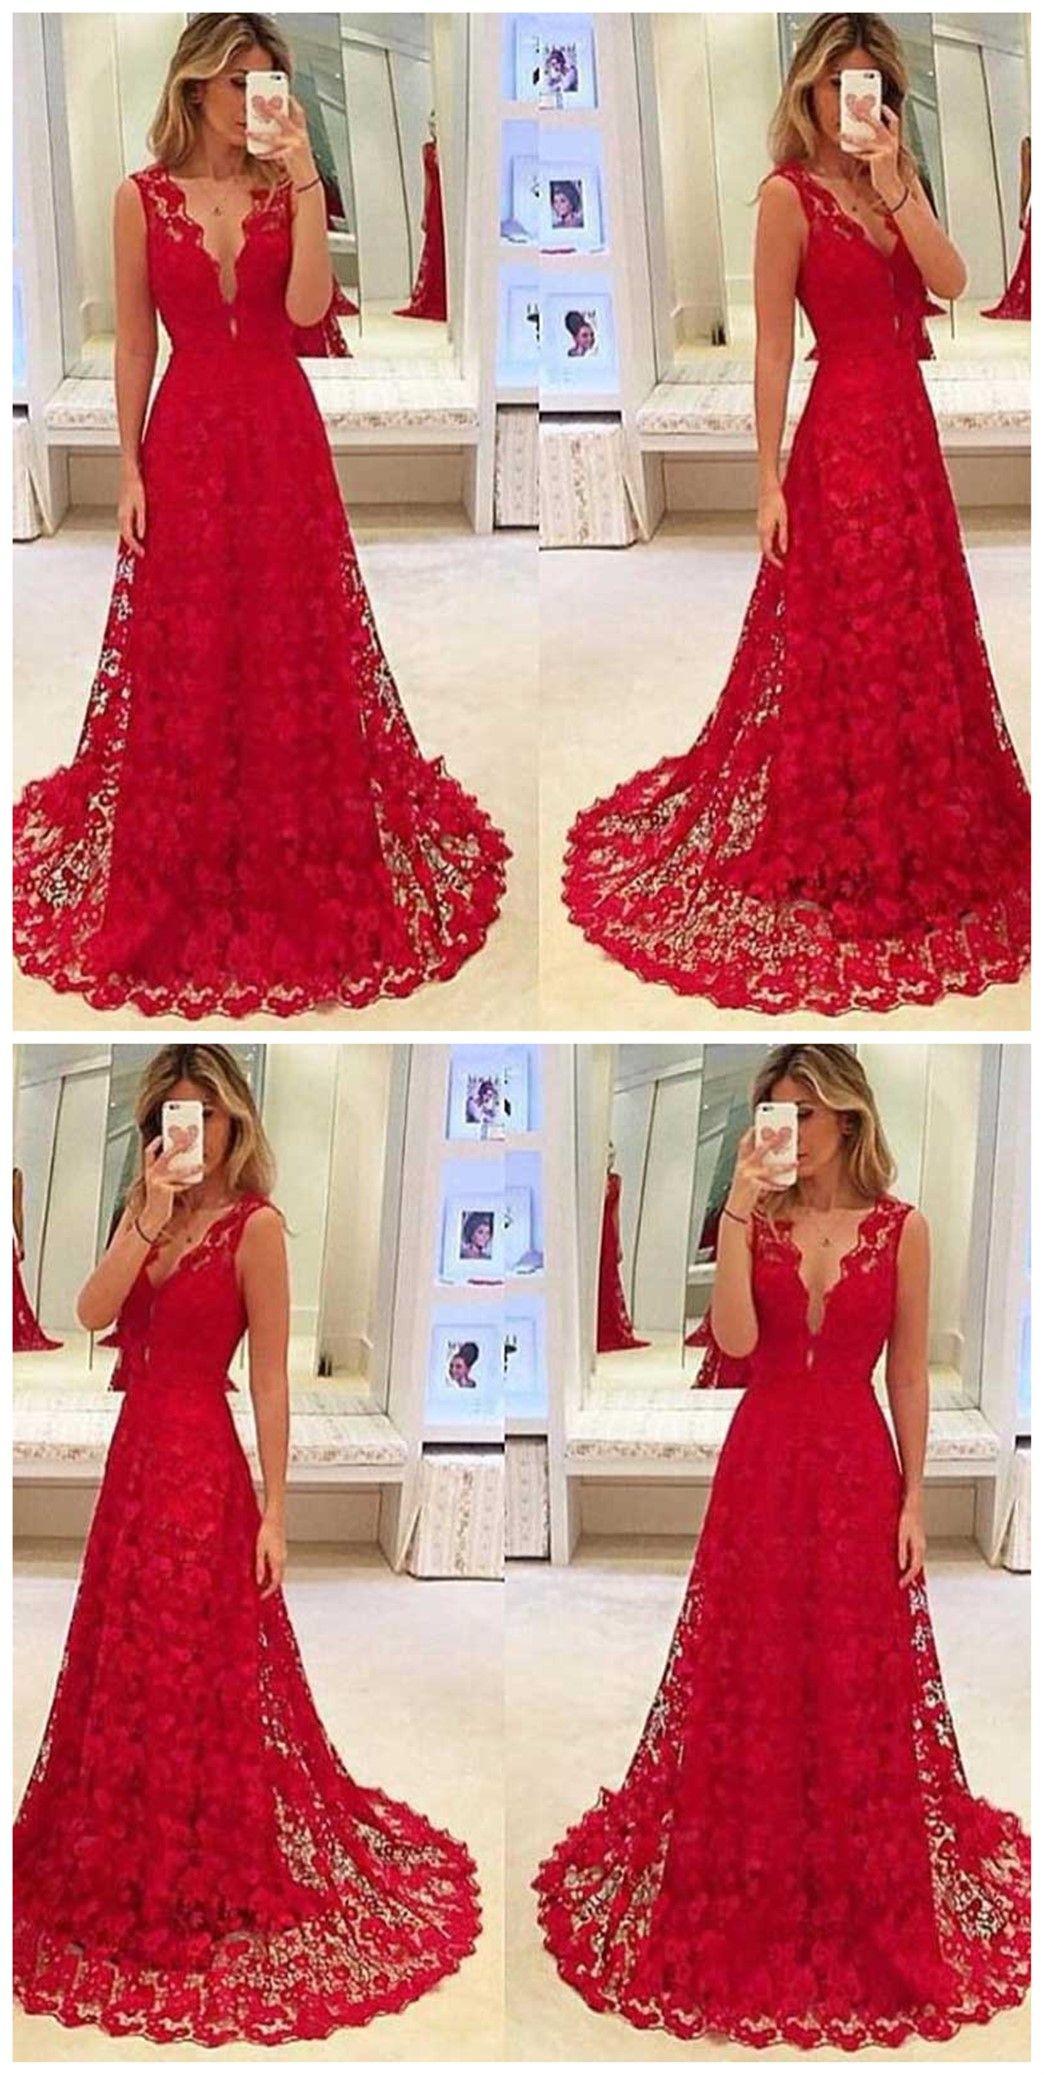 Red lace long prom dresses deep v neckline prom dresses custom